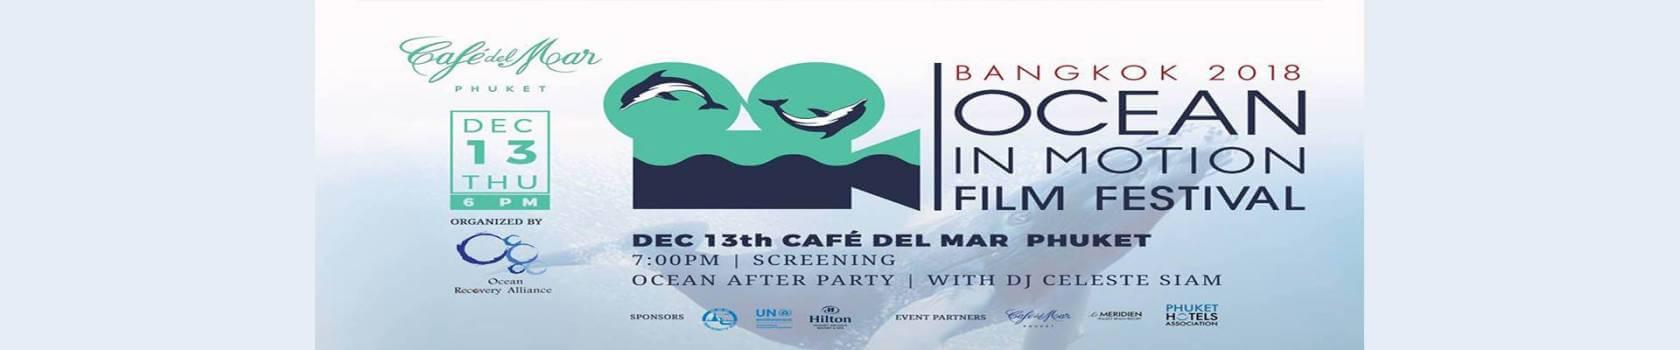 Ocean in Motion Film Festival 2018 at Cafe del Mar Phuket